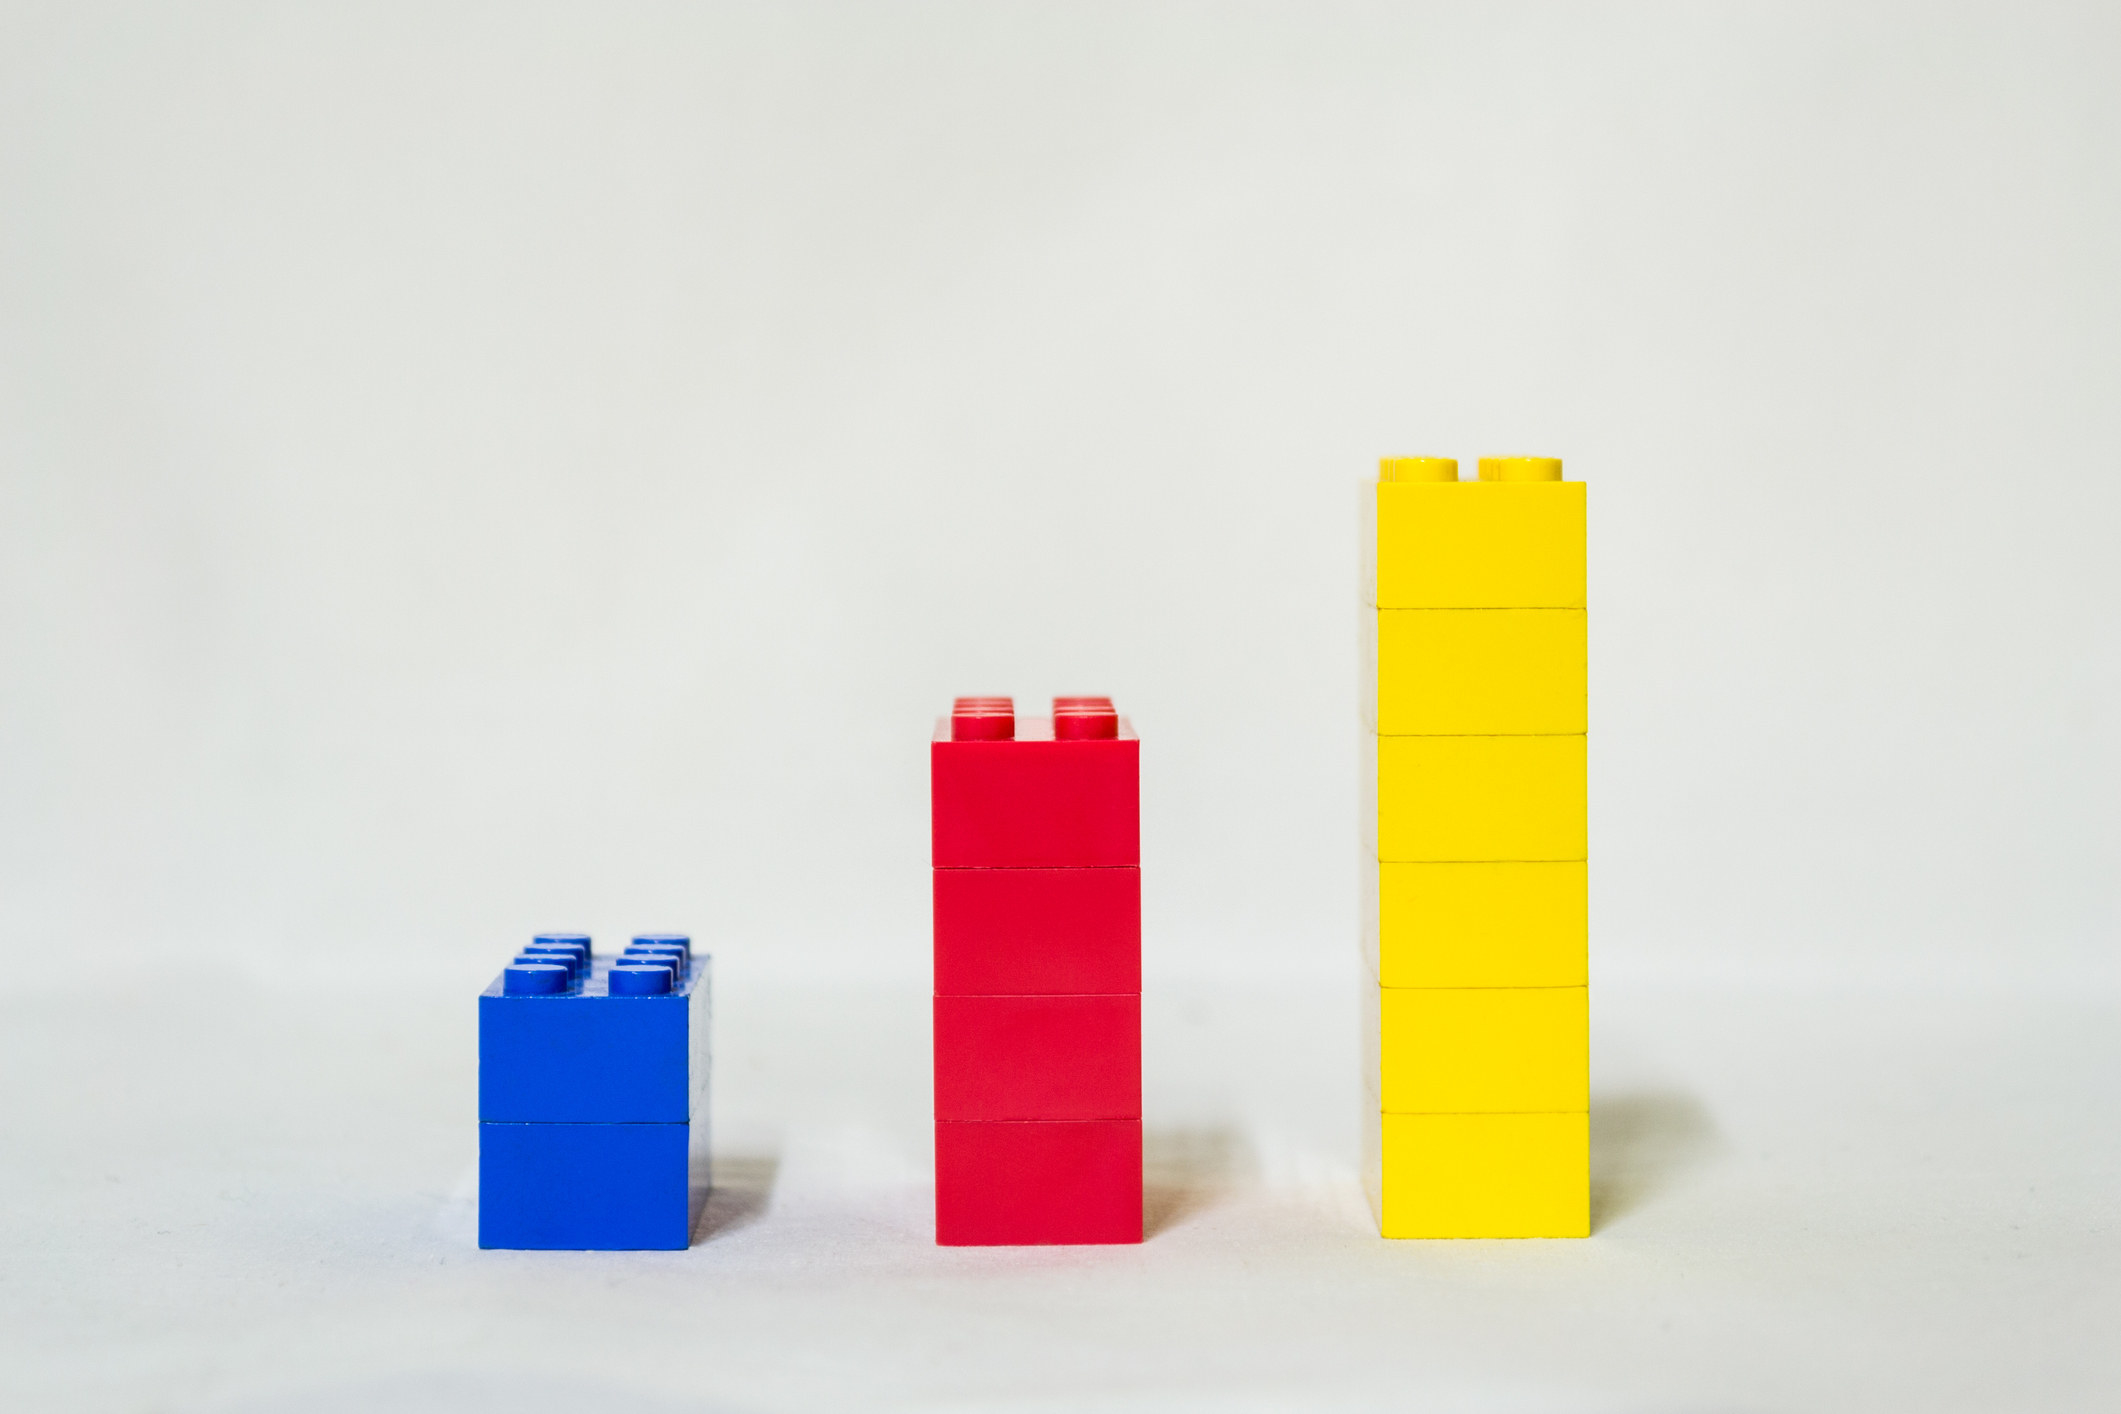 Stacks of lego blocks